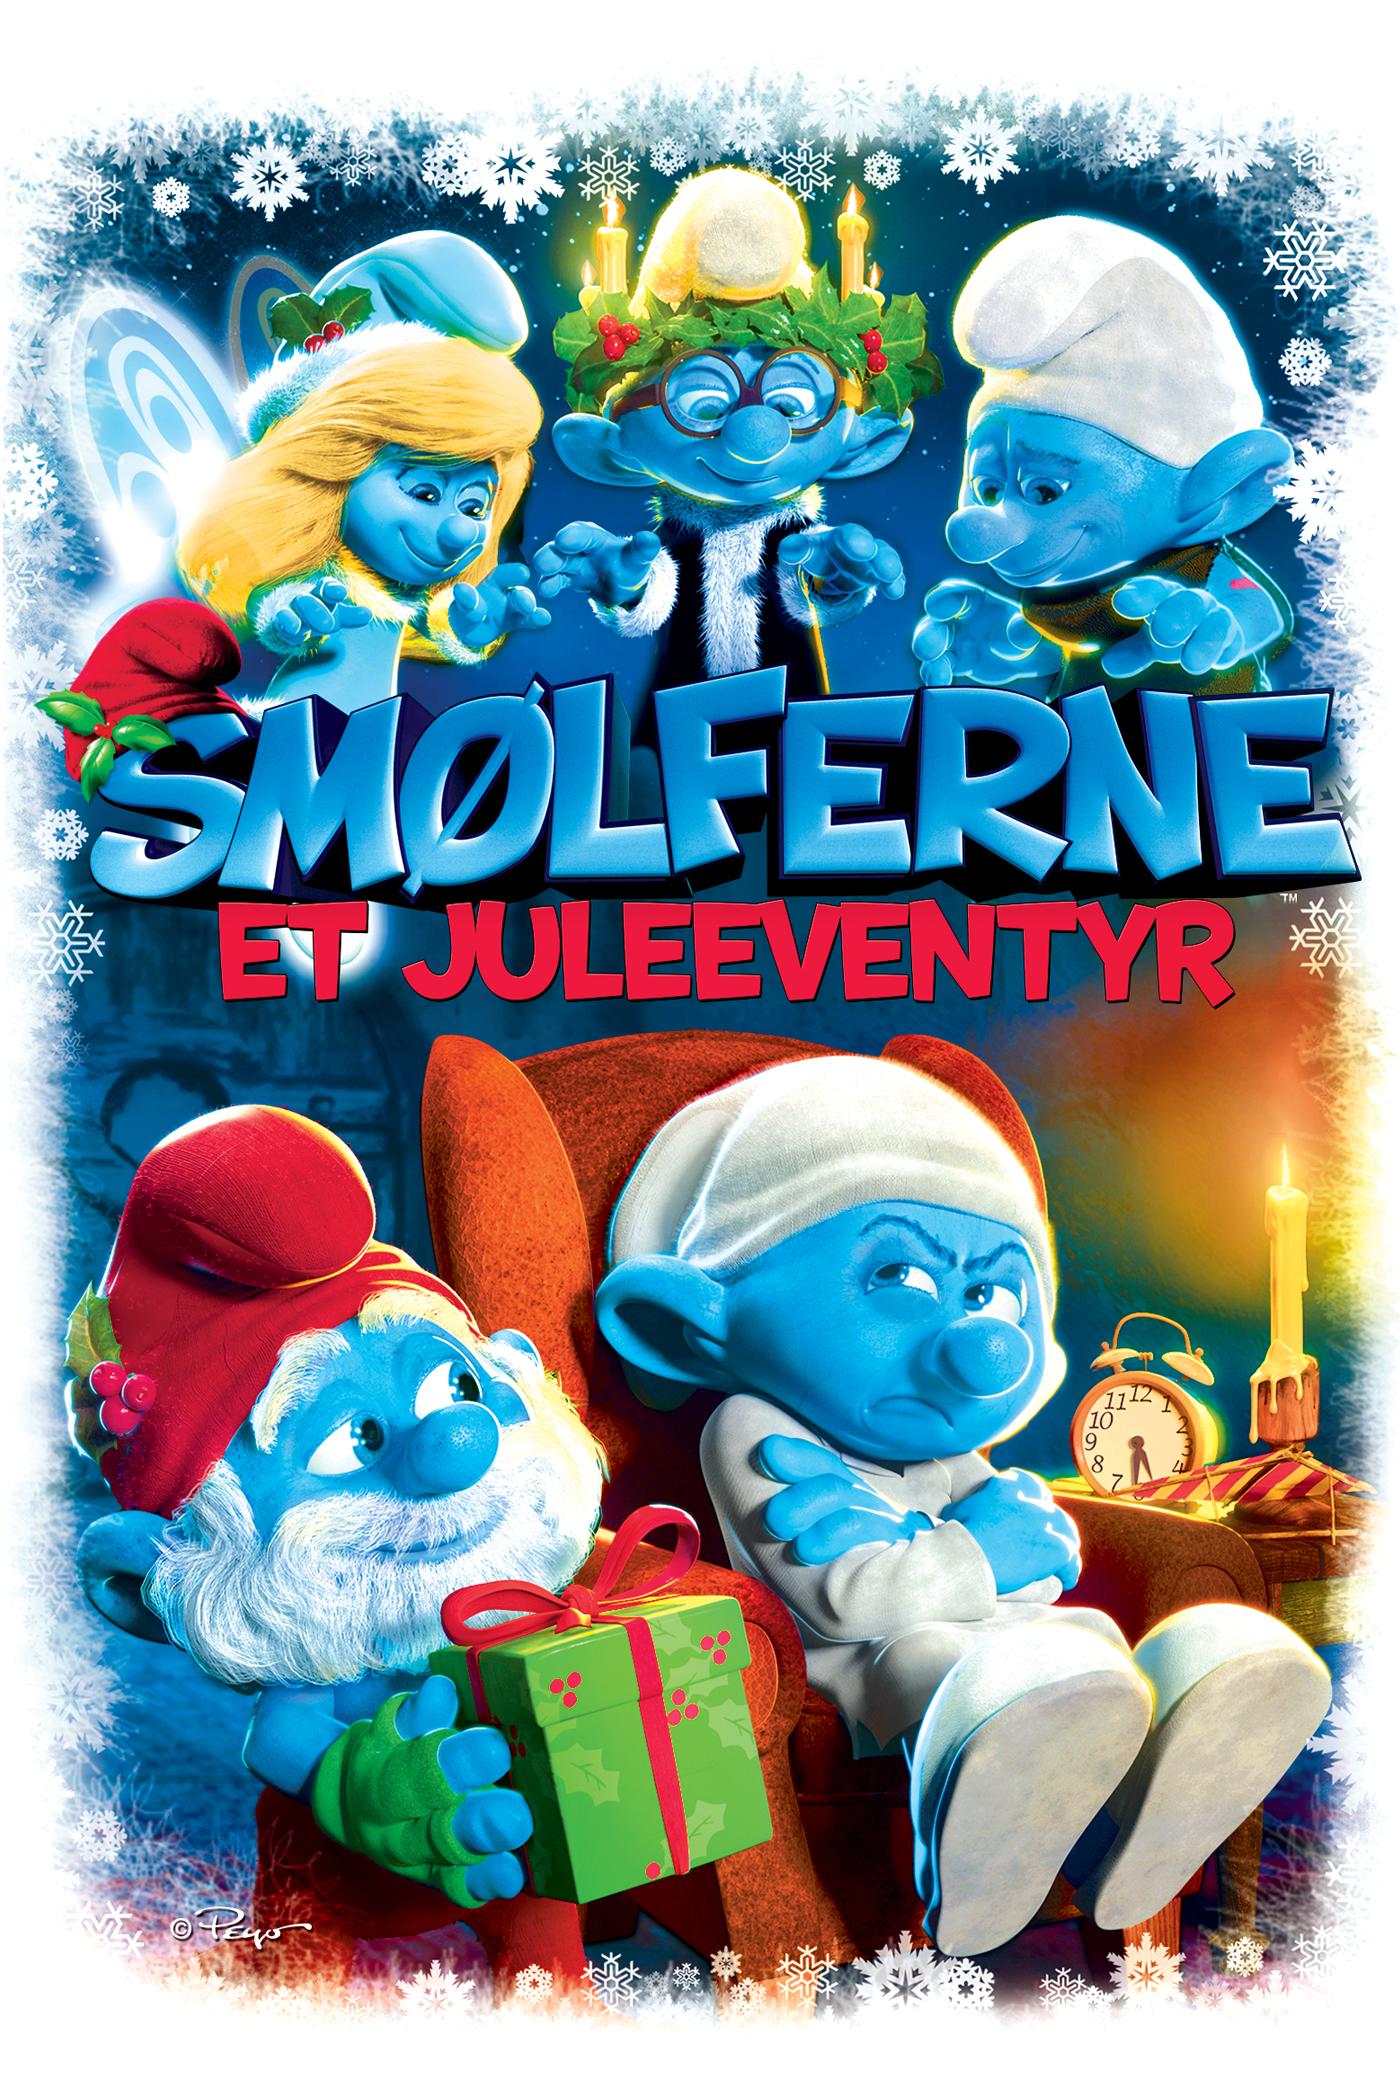 Smølferne –Et Juleeventyr